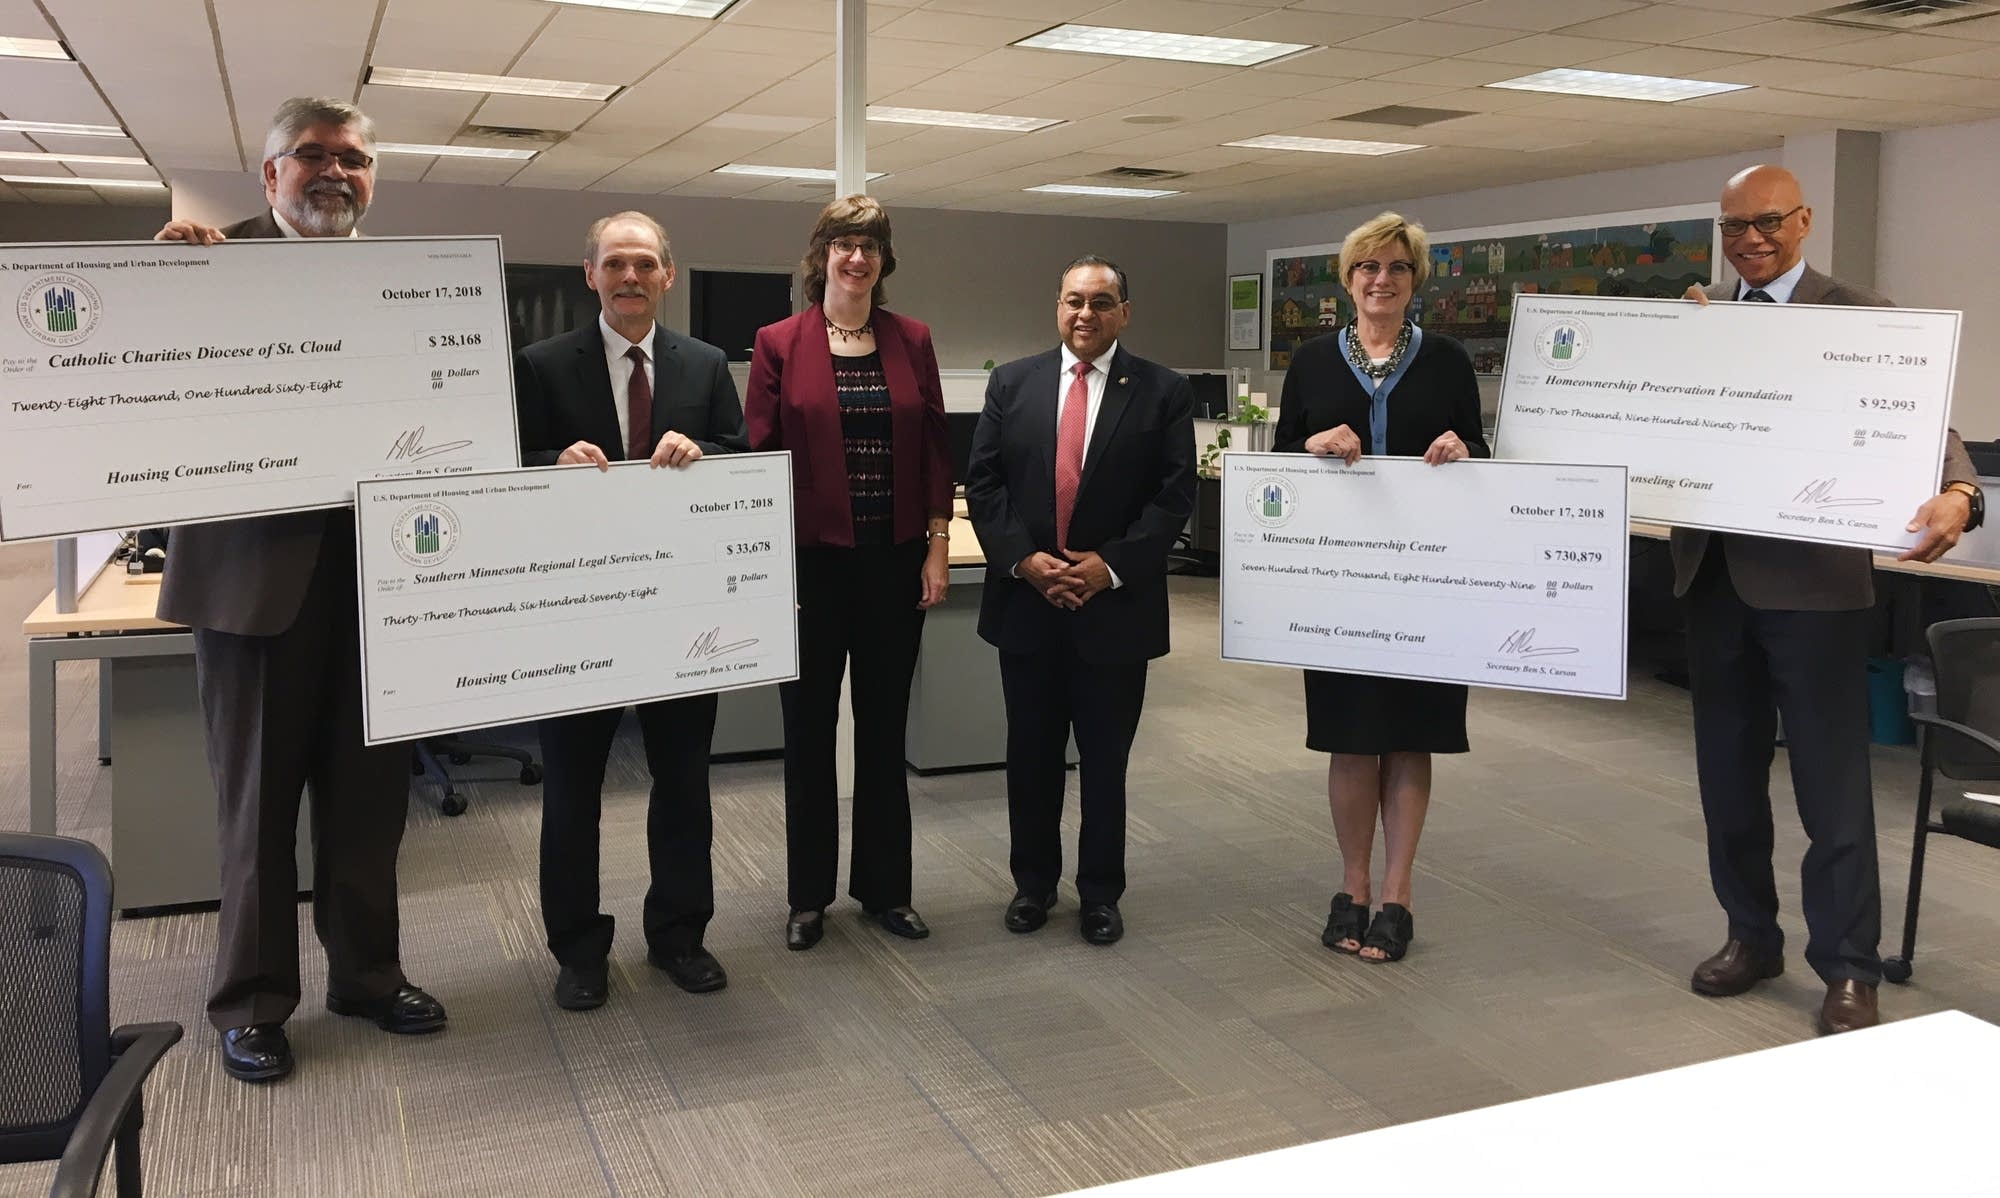 Representatives hold up checks at the Minnesota Homeownership Center